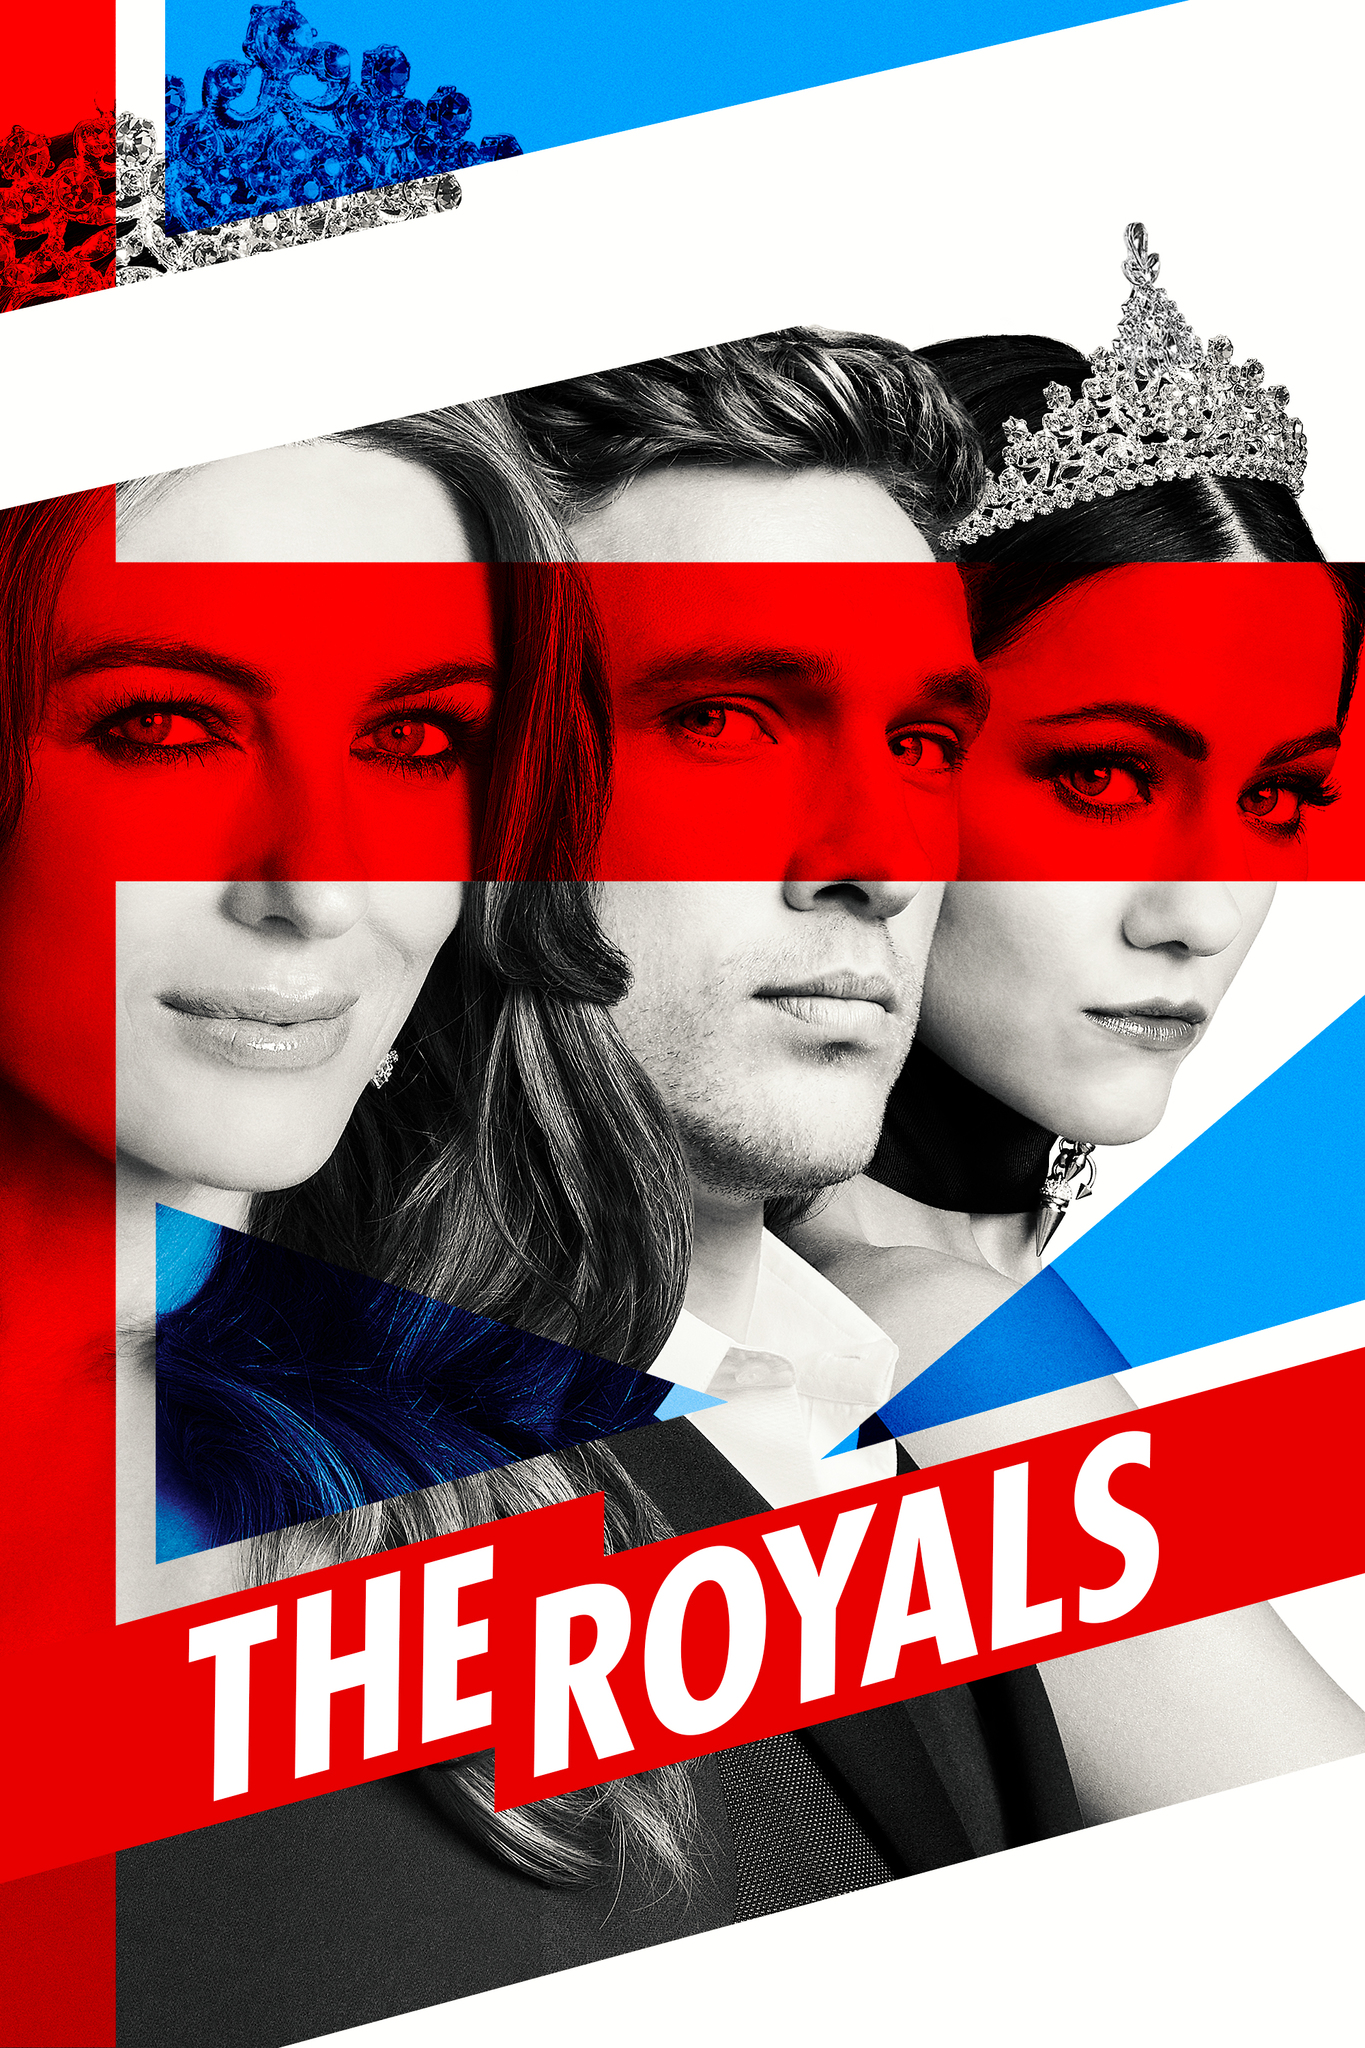 The.Royals.2015.S04E04.German.DL.DUBBED.720p.WebHD.x264-AIDA